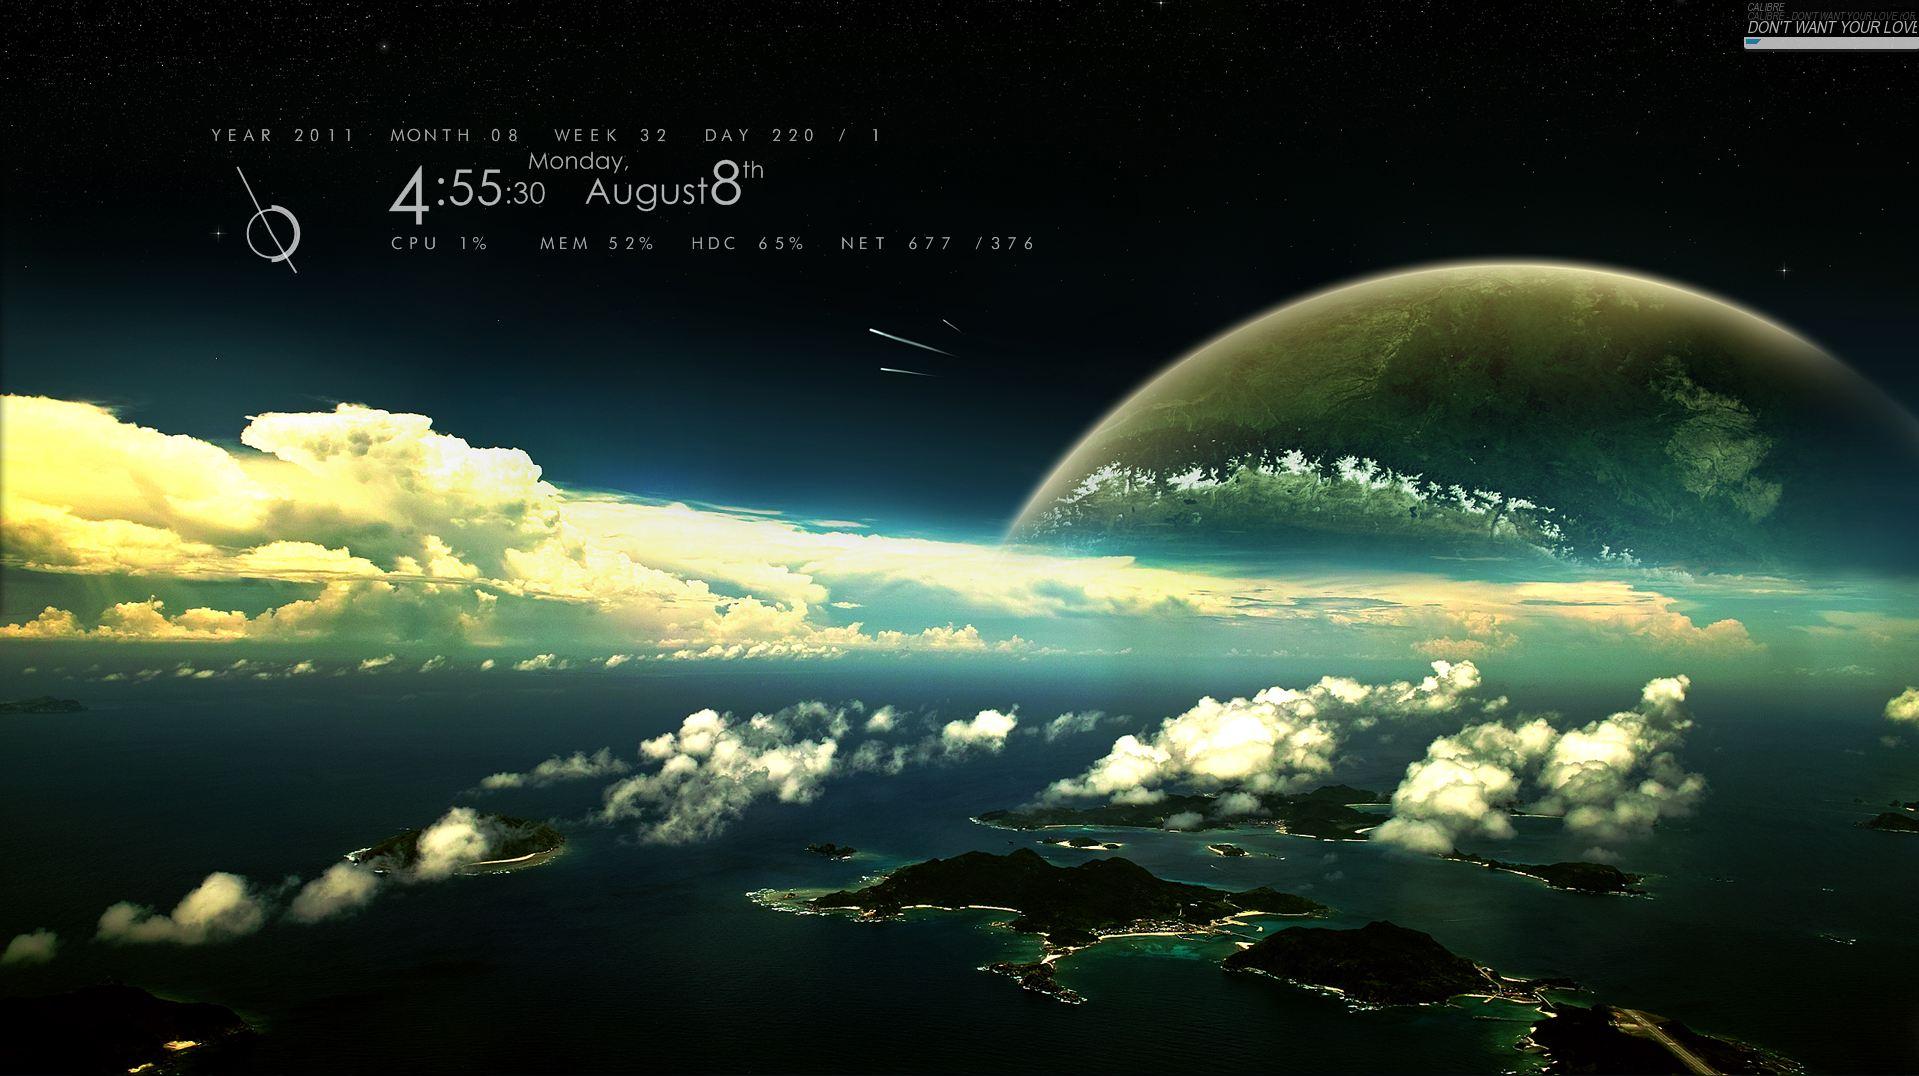 Best Desktop Background Images in HD 1919x1076